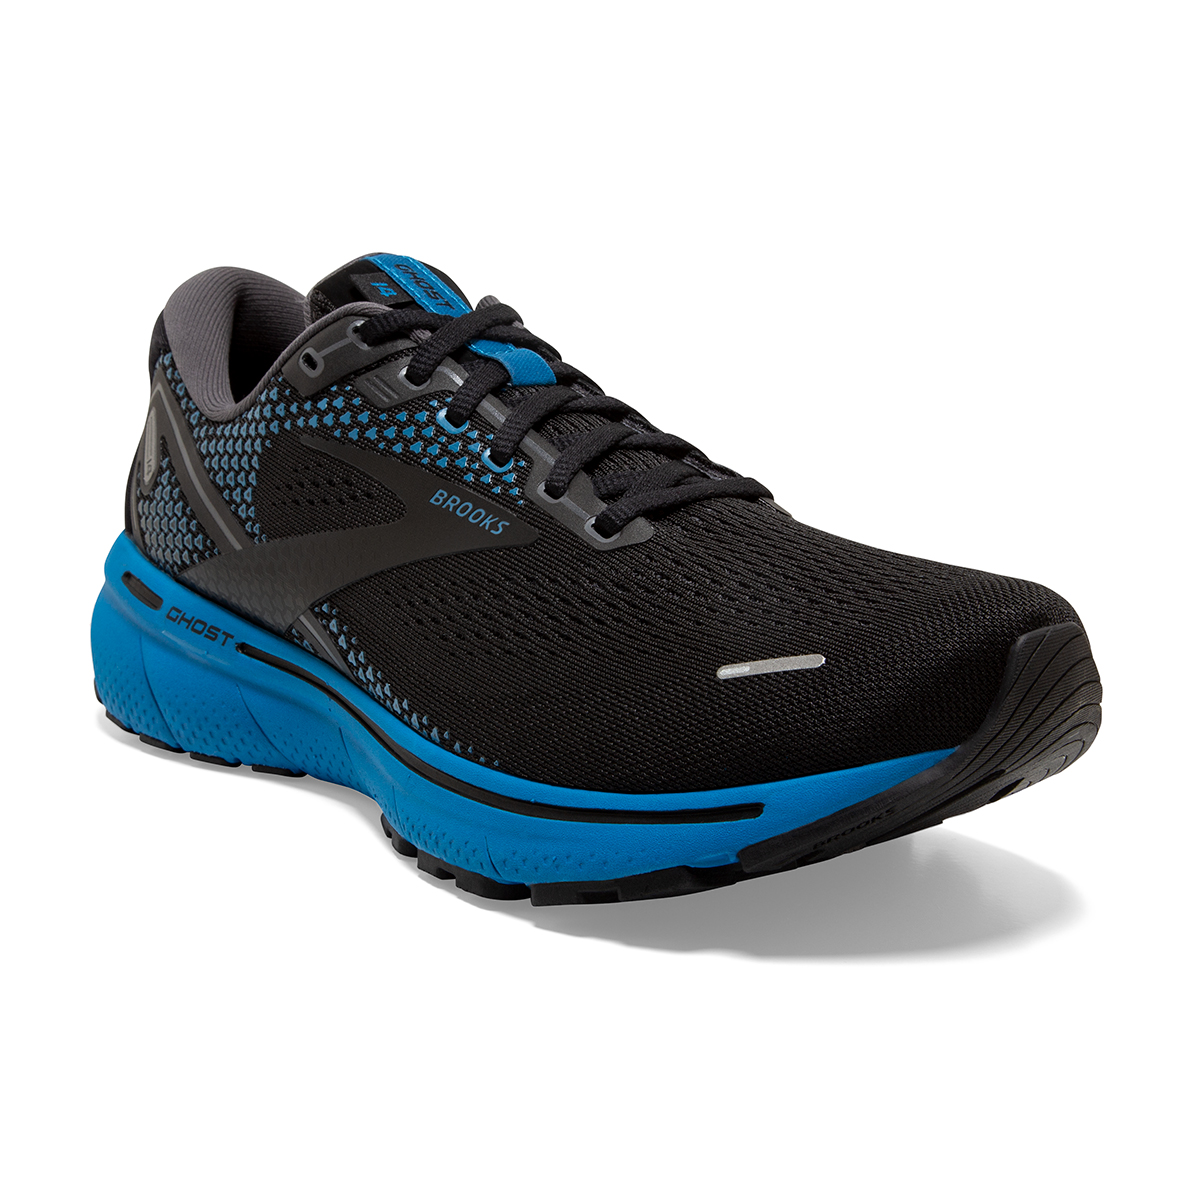 Men's Brooks Ghost 14 Running Shoe - Color: Black/Blackened - Size: 7 - Width: Regular, Black/Blackened, large, image 5